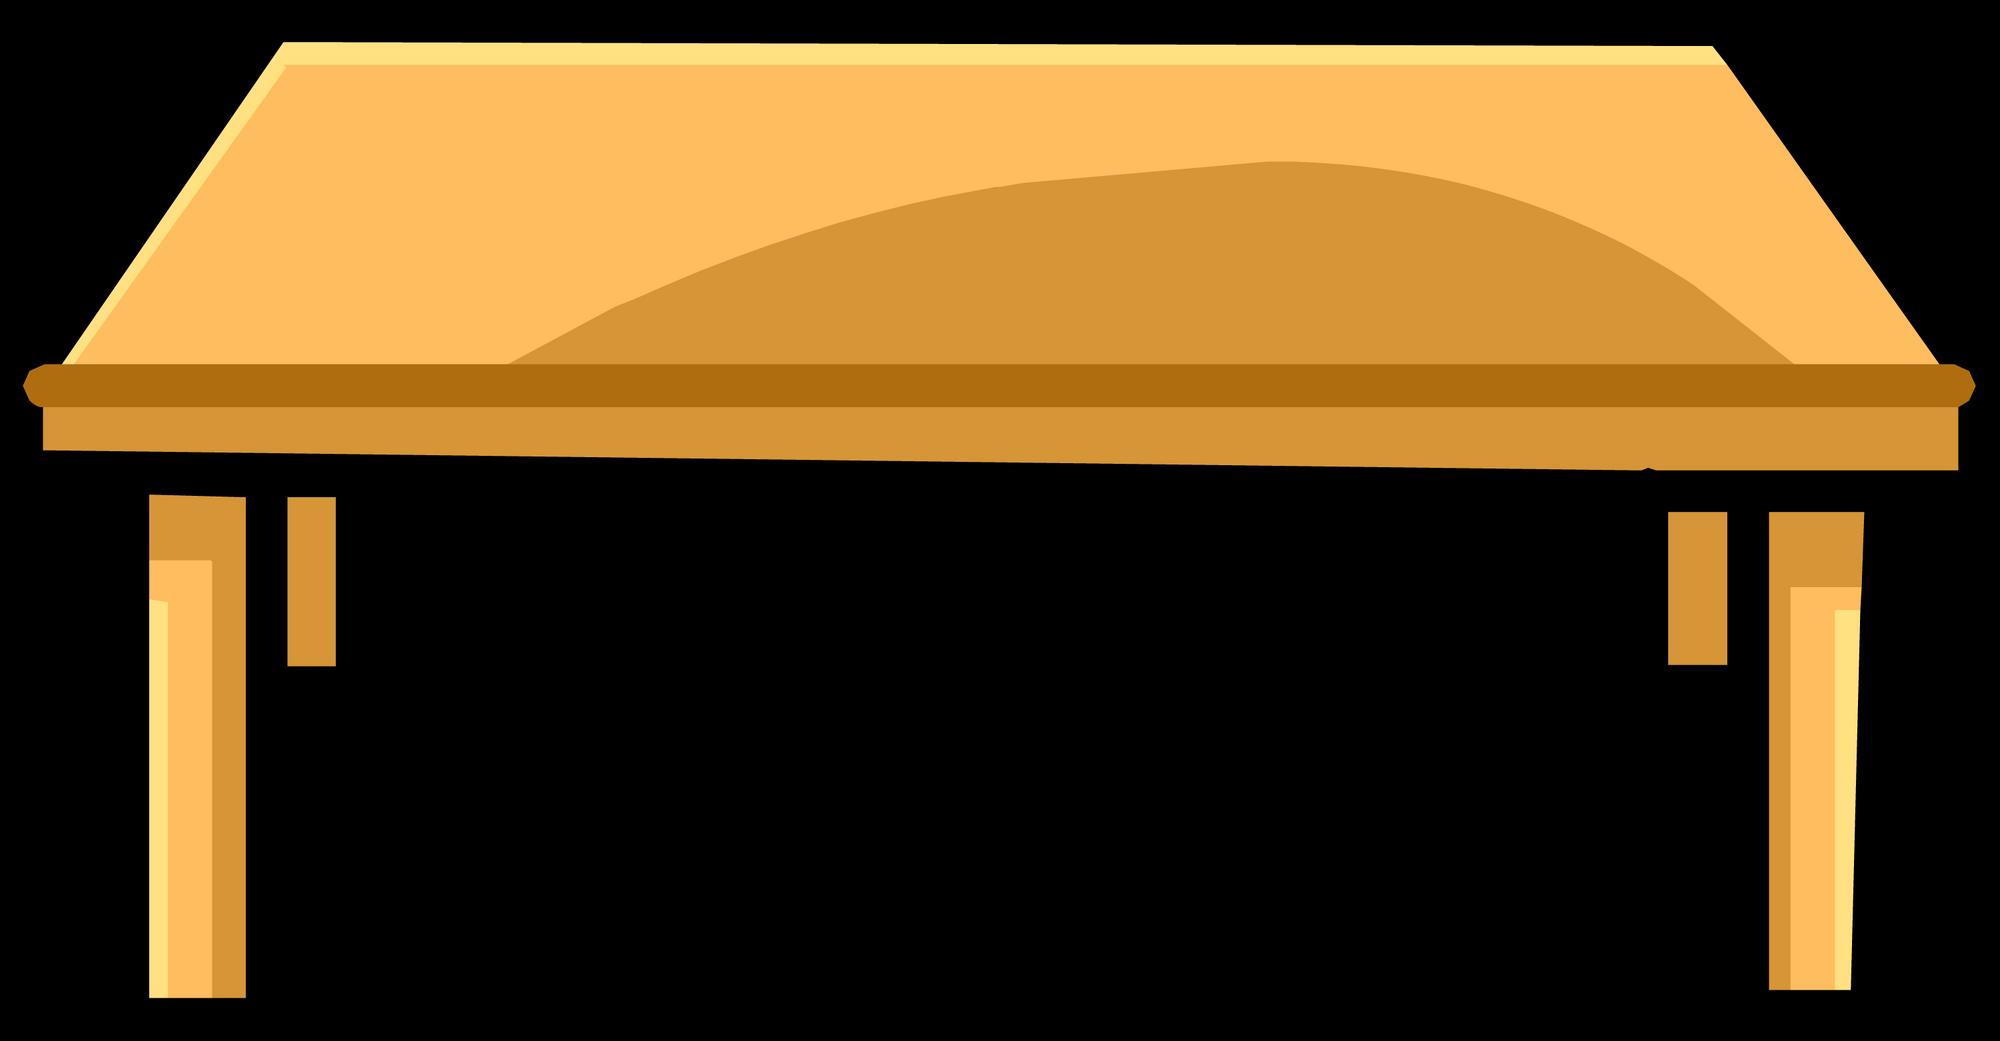 Coffee Table (ID 584) | Club Penguin Wiki | Fandom powered ...